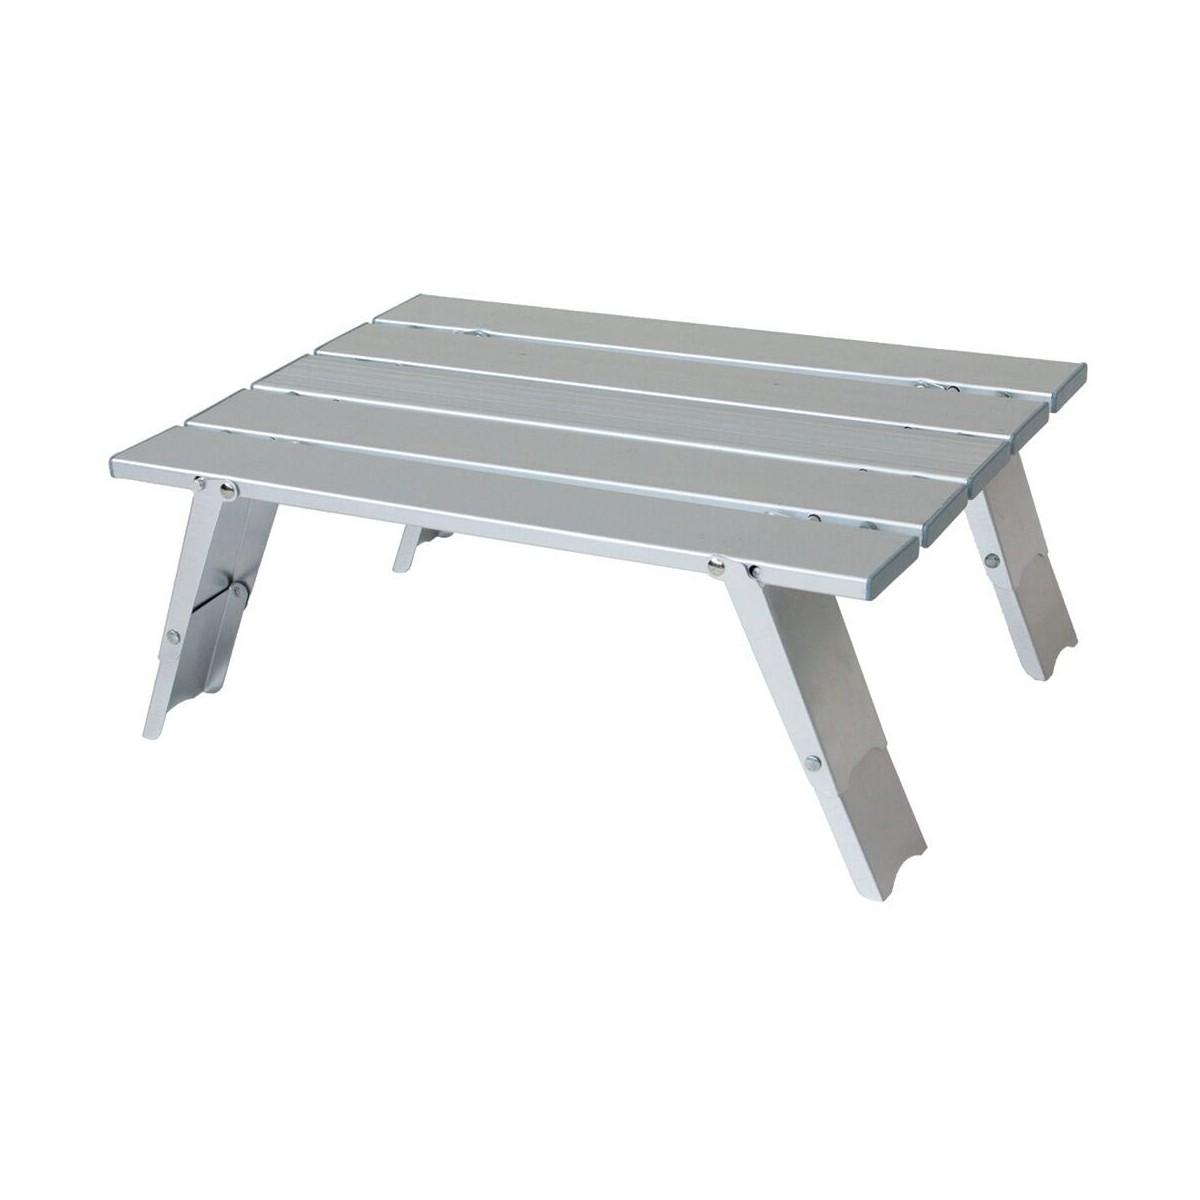 Mini table pliable de camping en alu yellowstone - Table pliante de marche ...